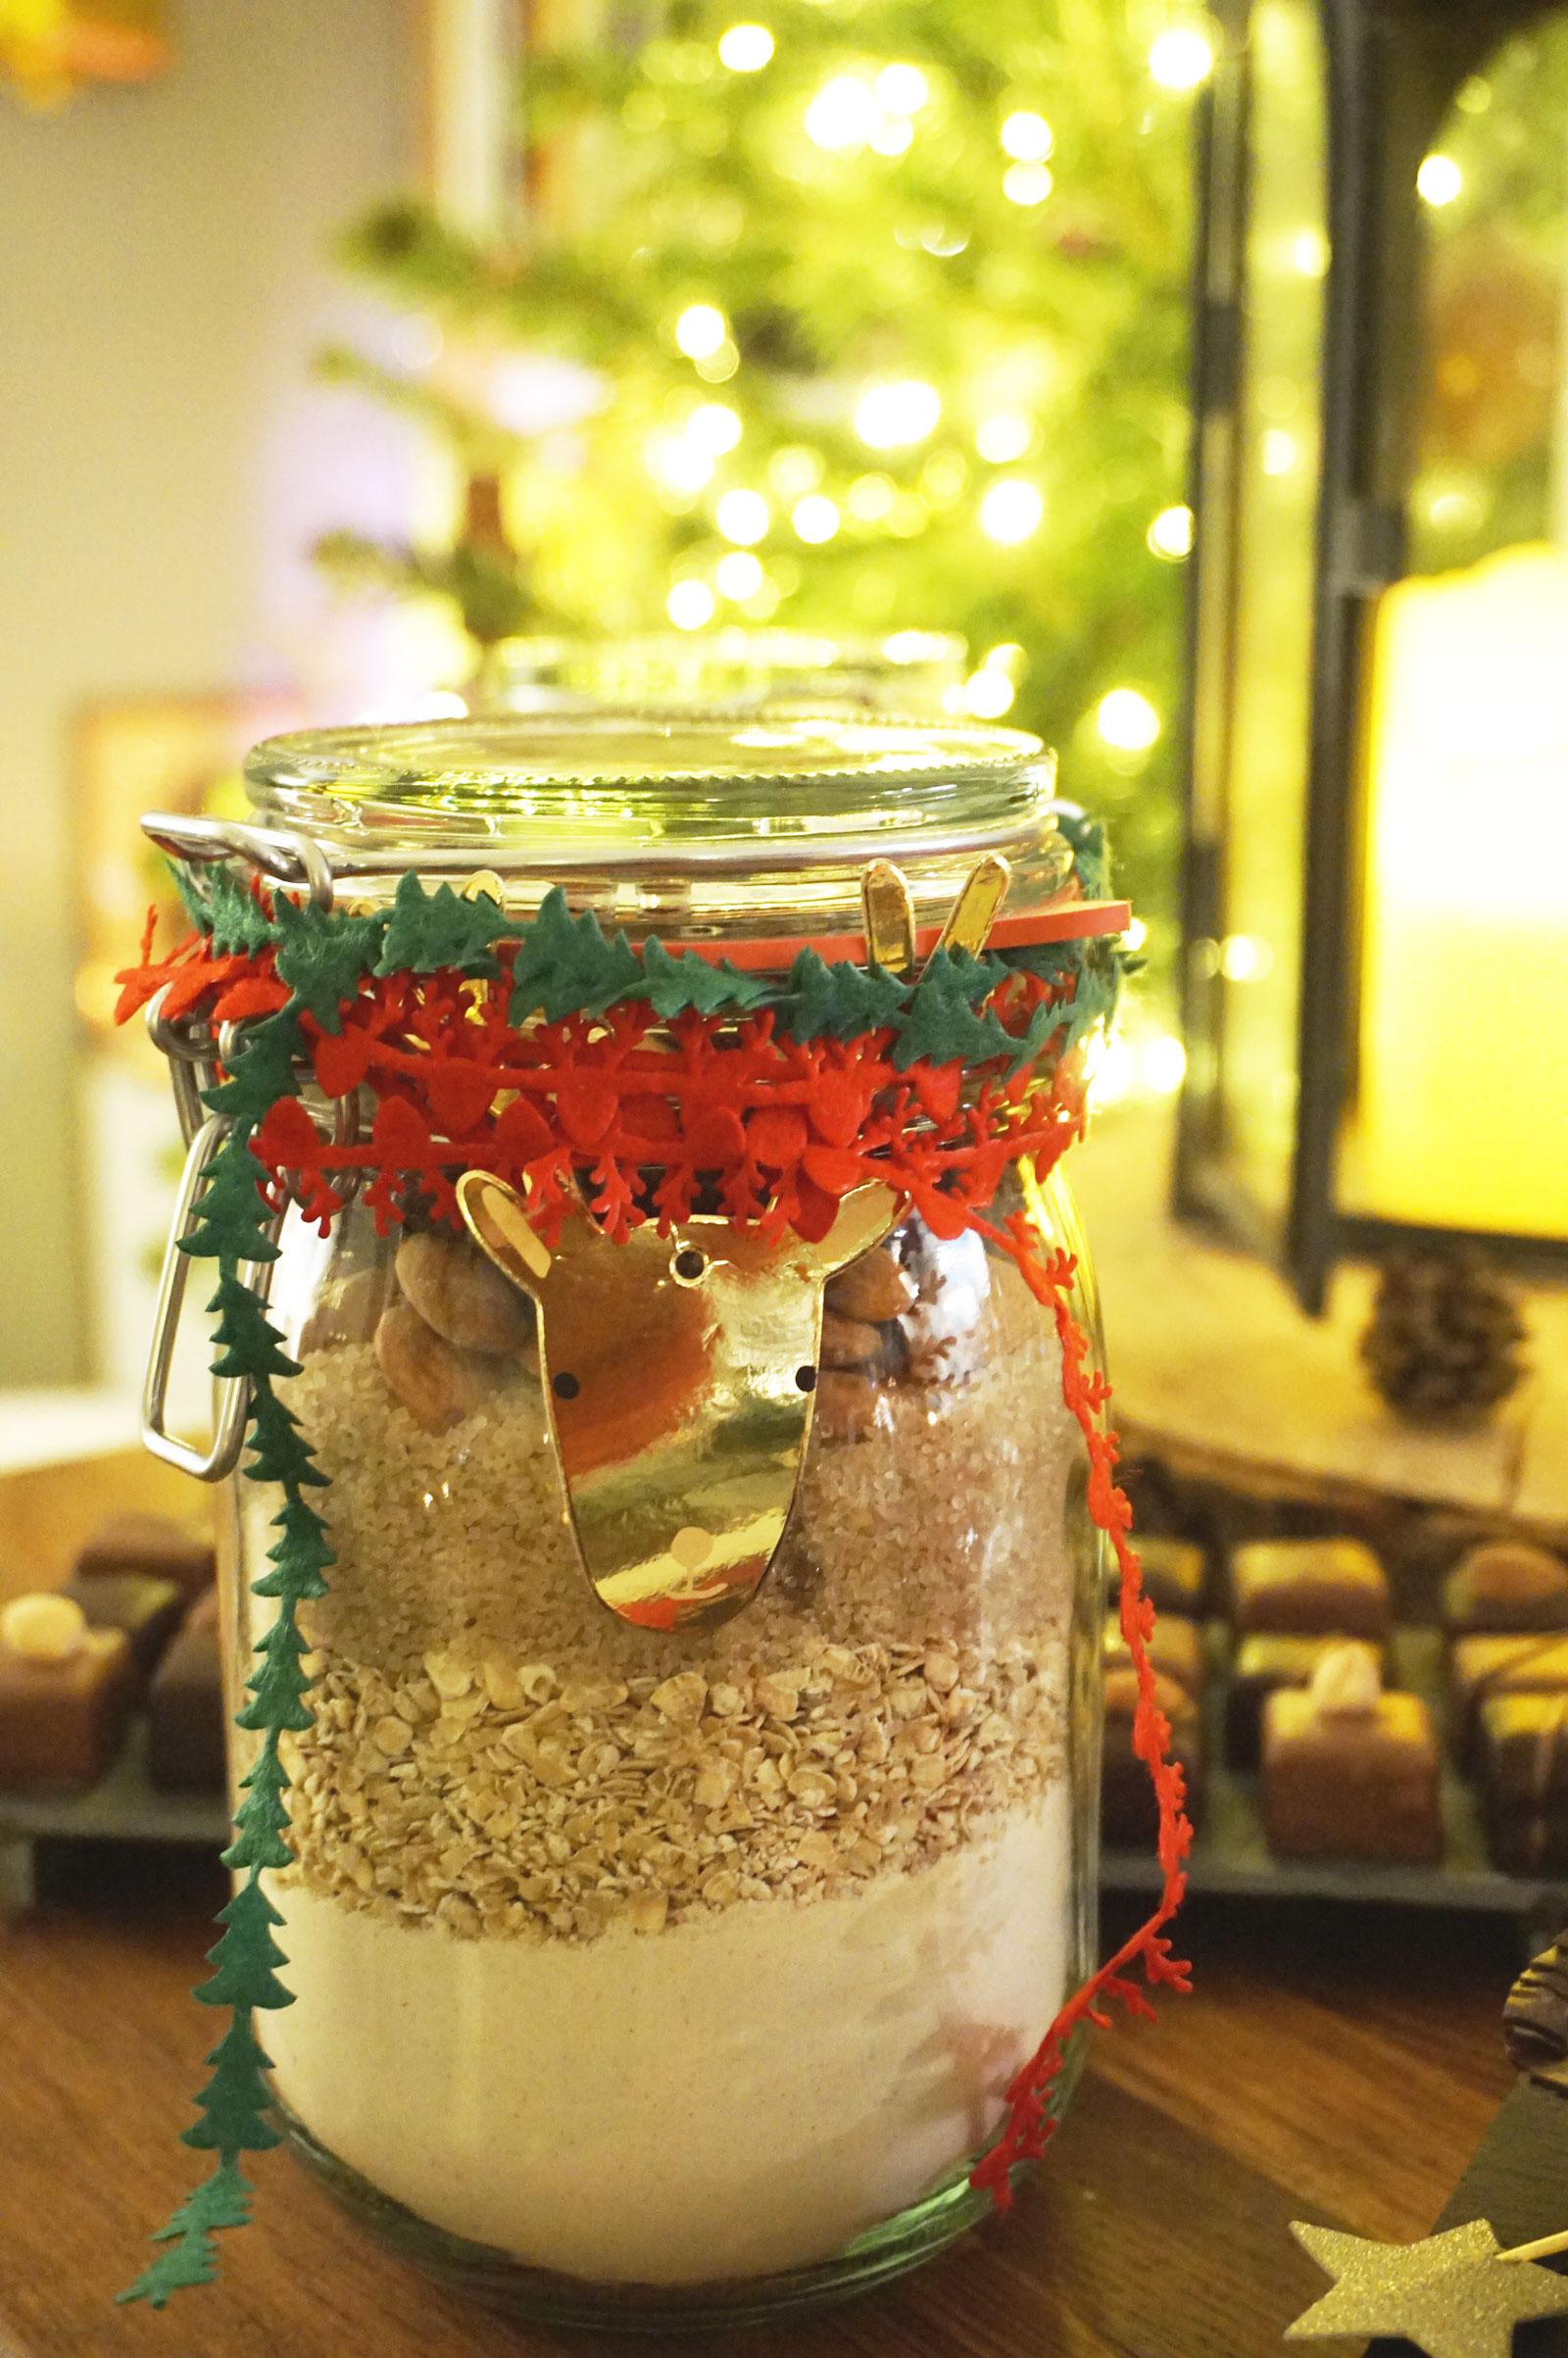 DIY Cookies Jar - Repas de Noël Toupargel